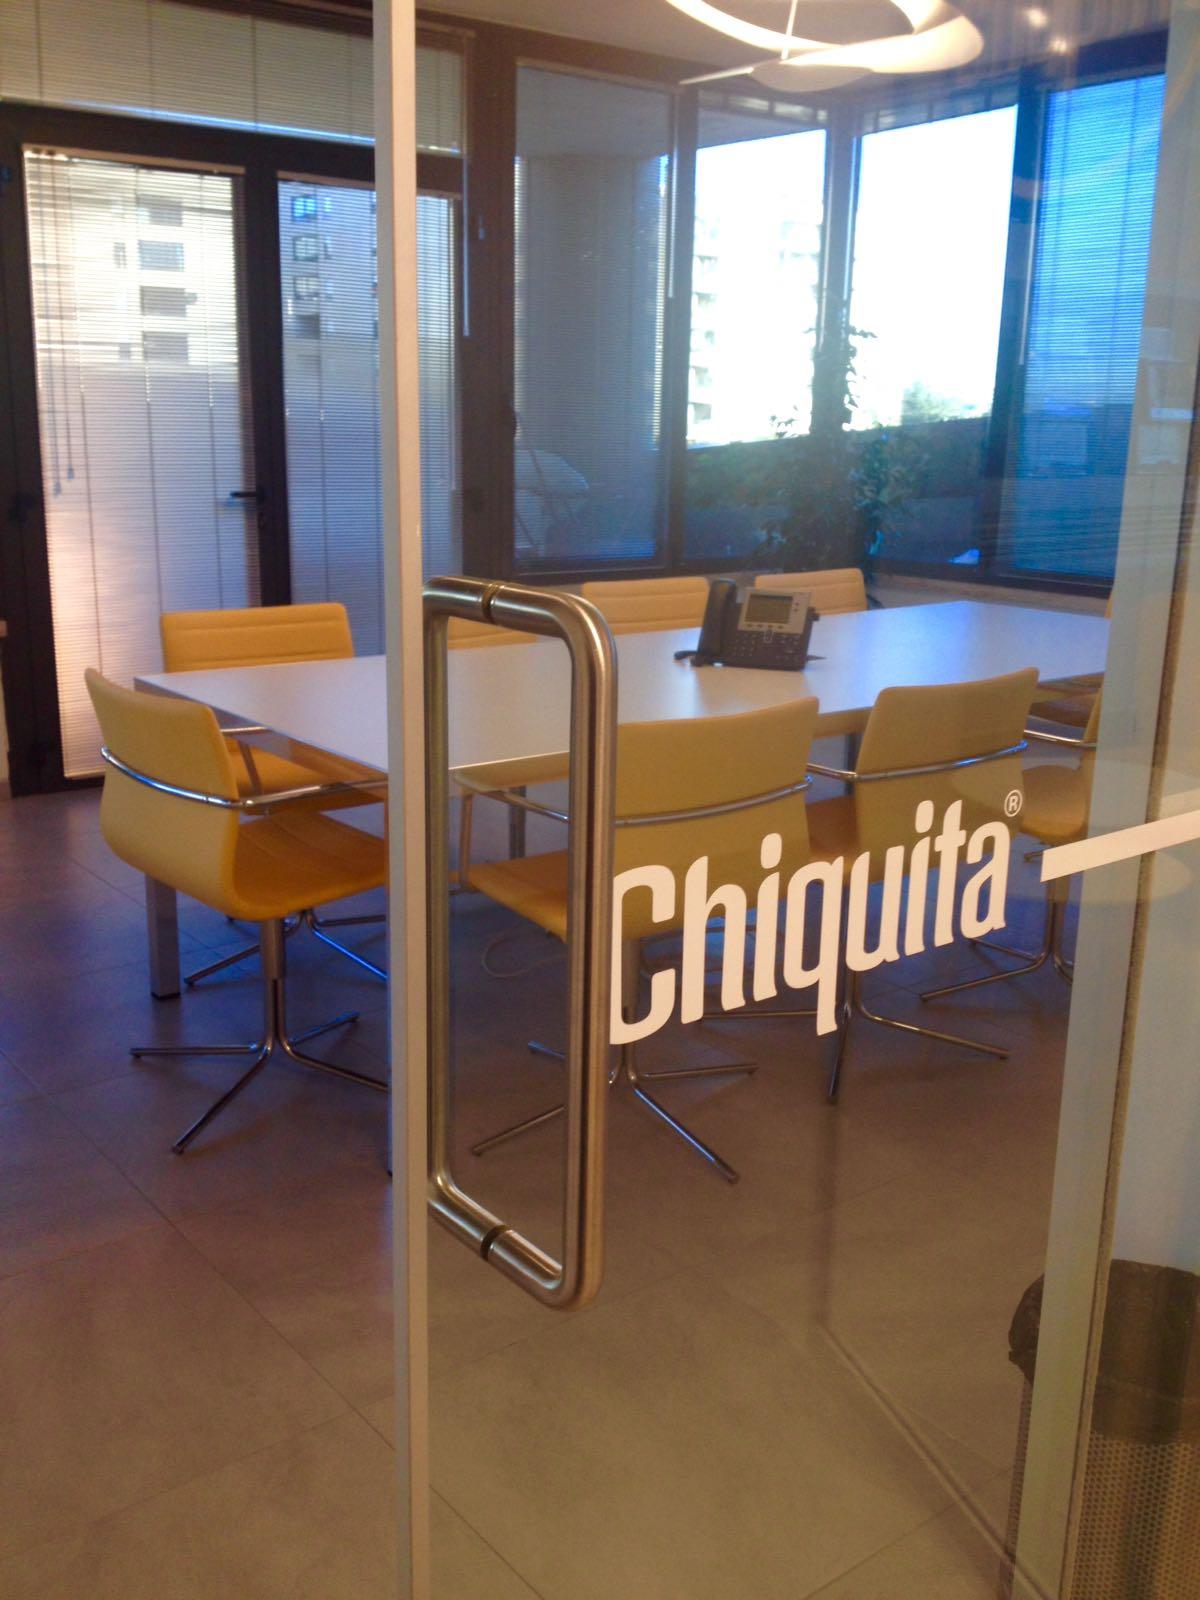 Chiquita – Uffici Roma